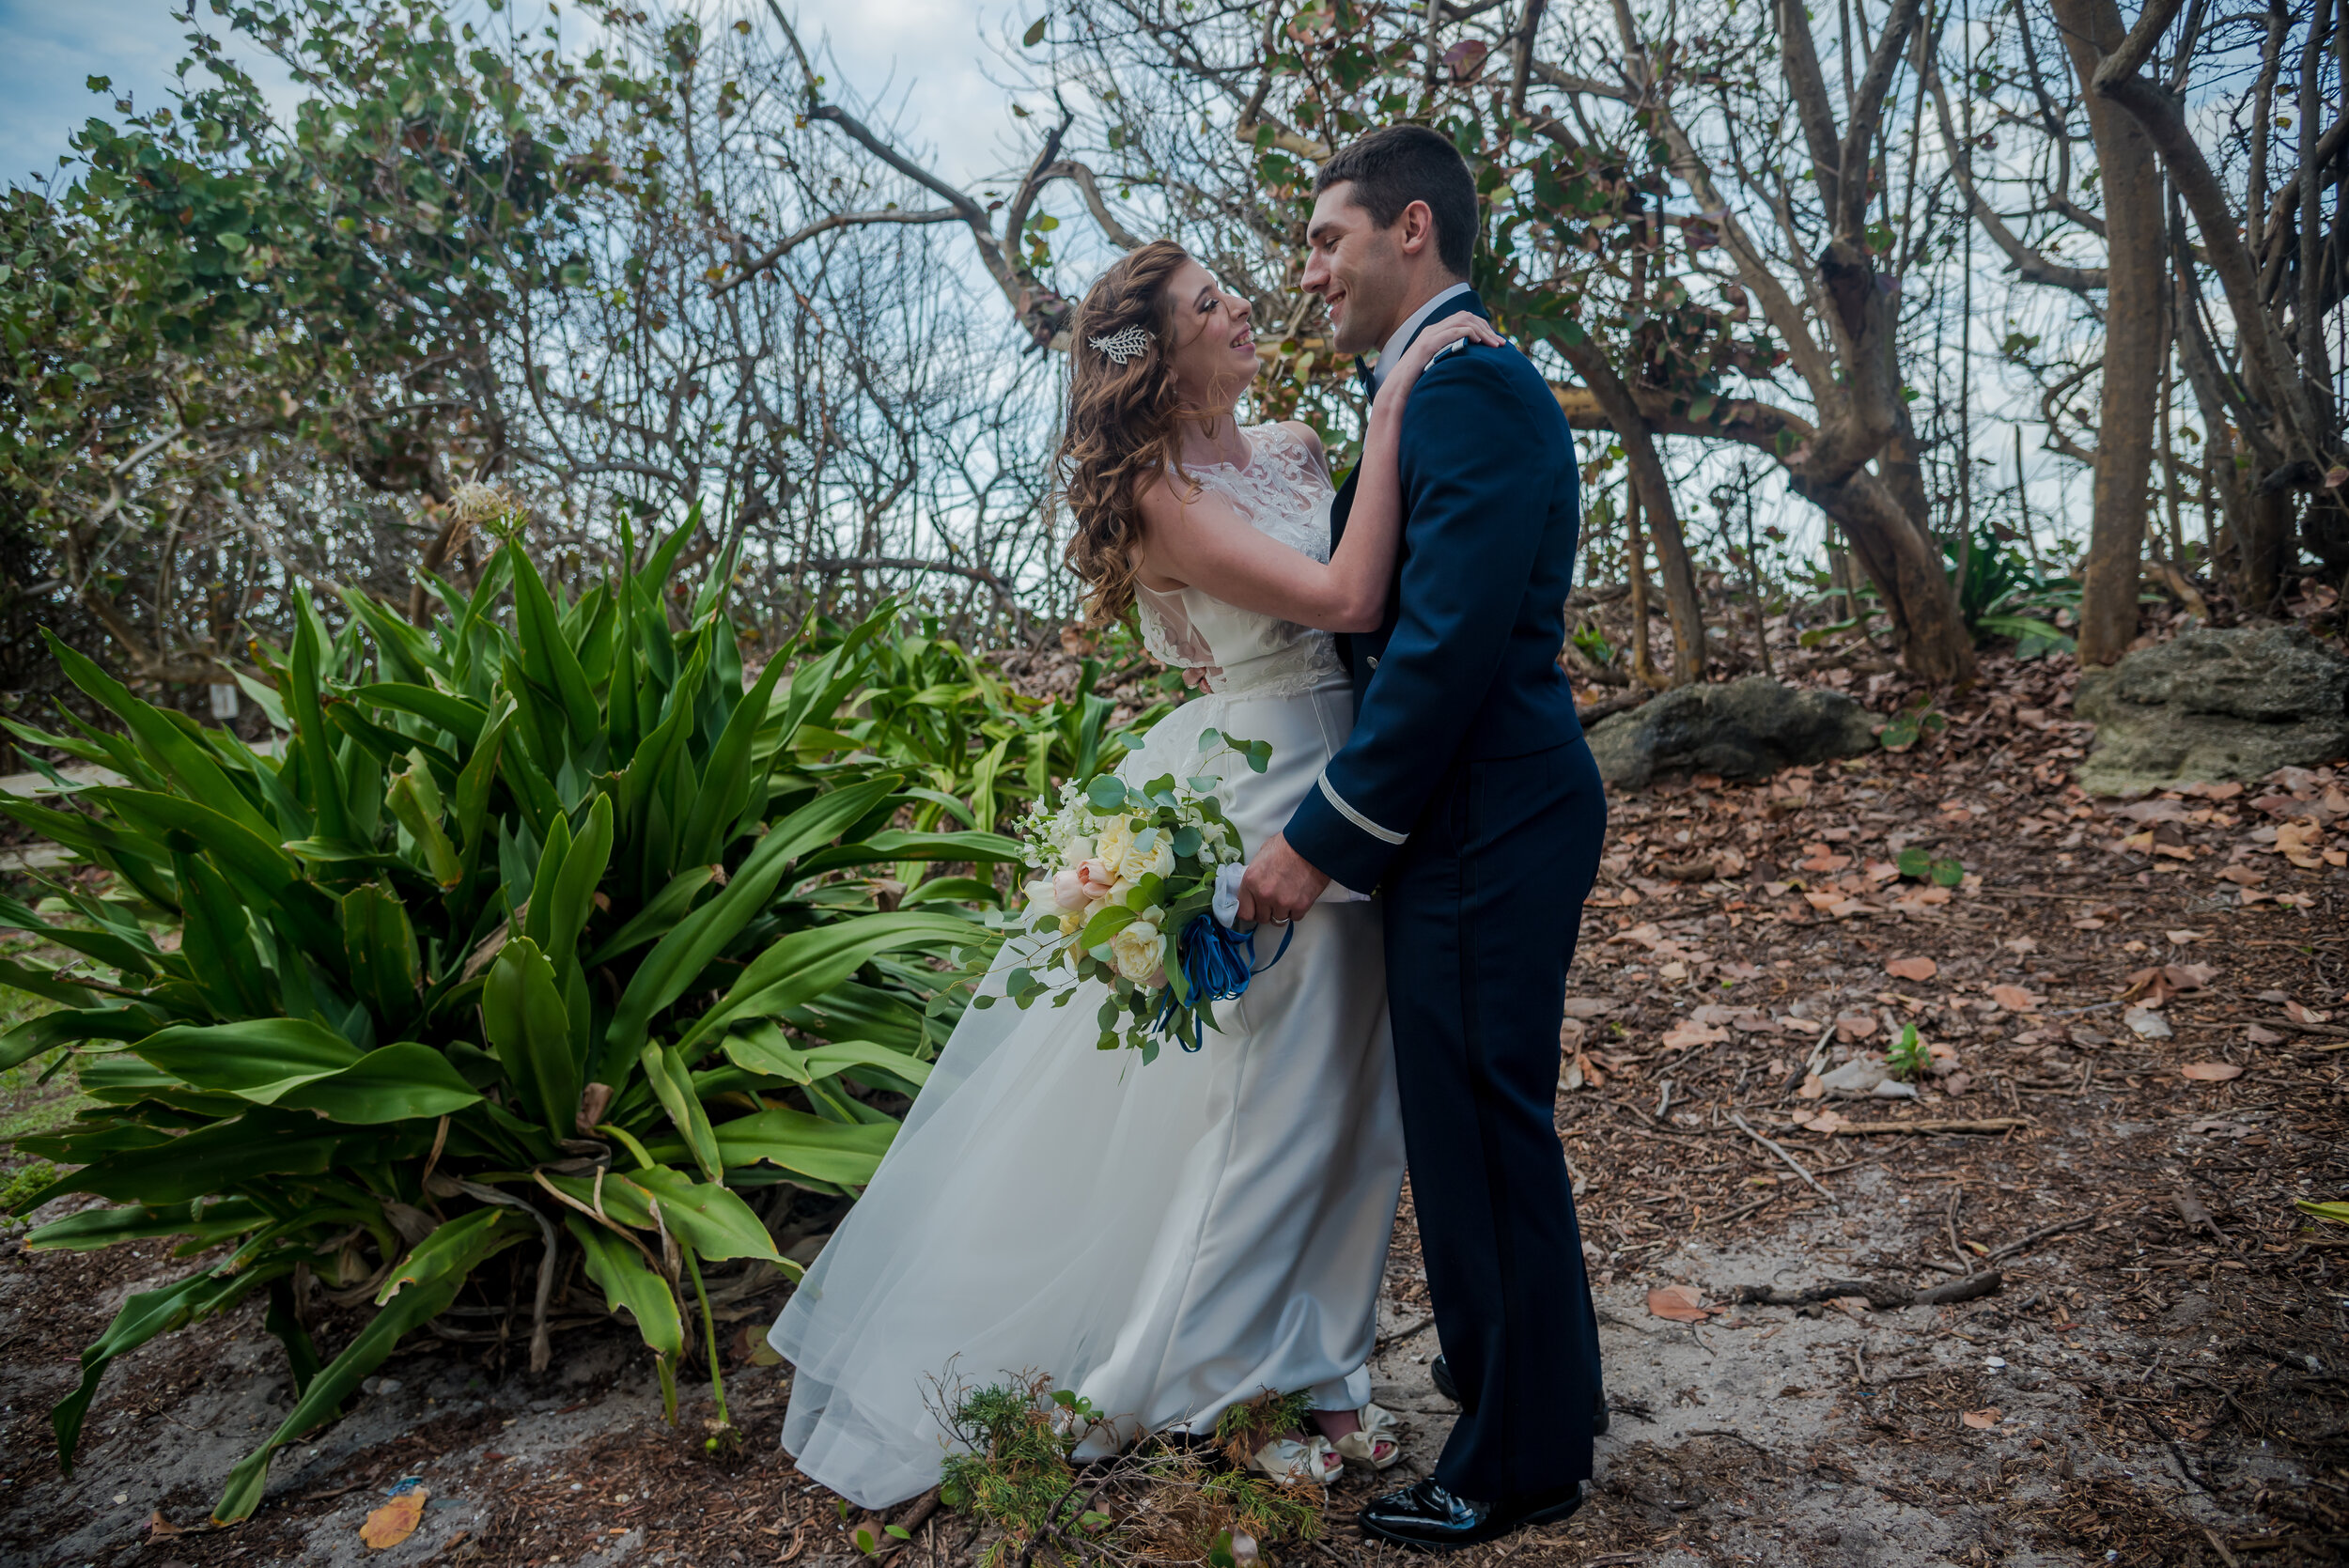 andru-the-tide-club-air-force-wedding-patrickafb-1-17.jpg